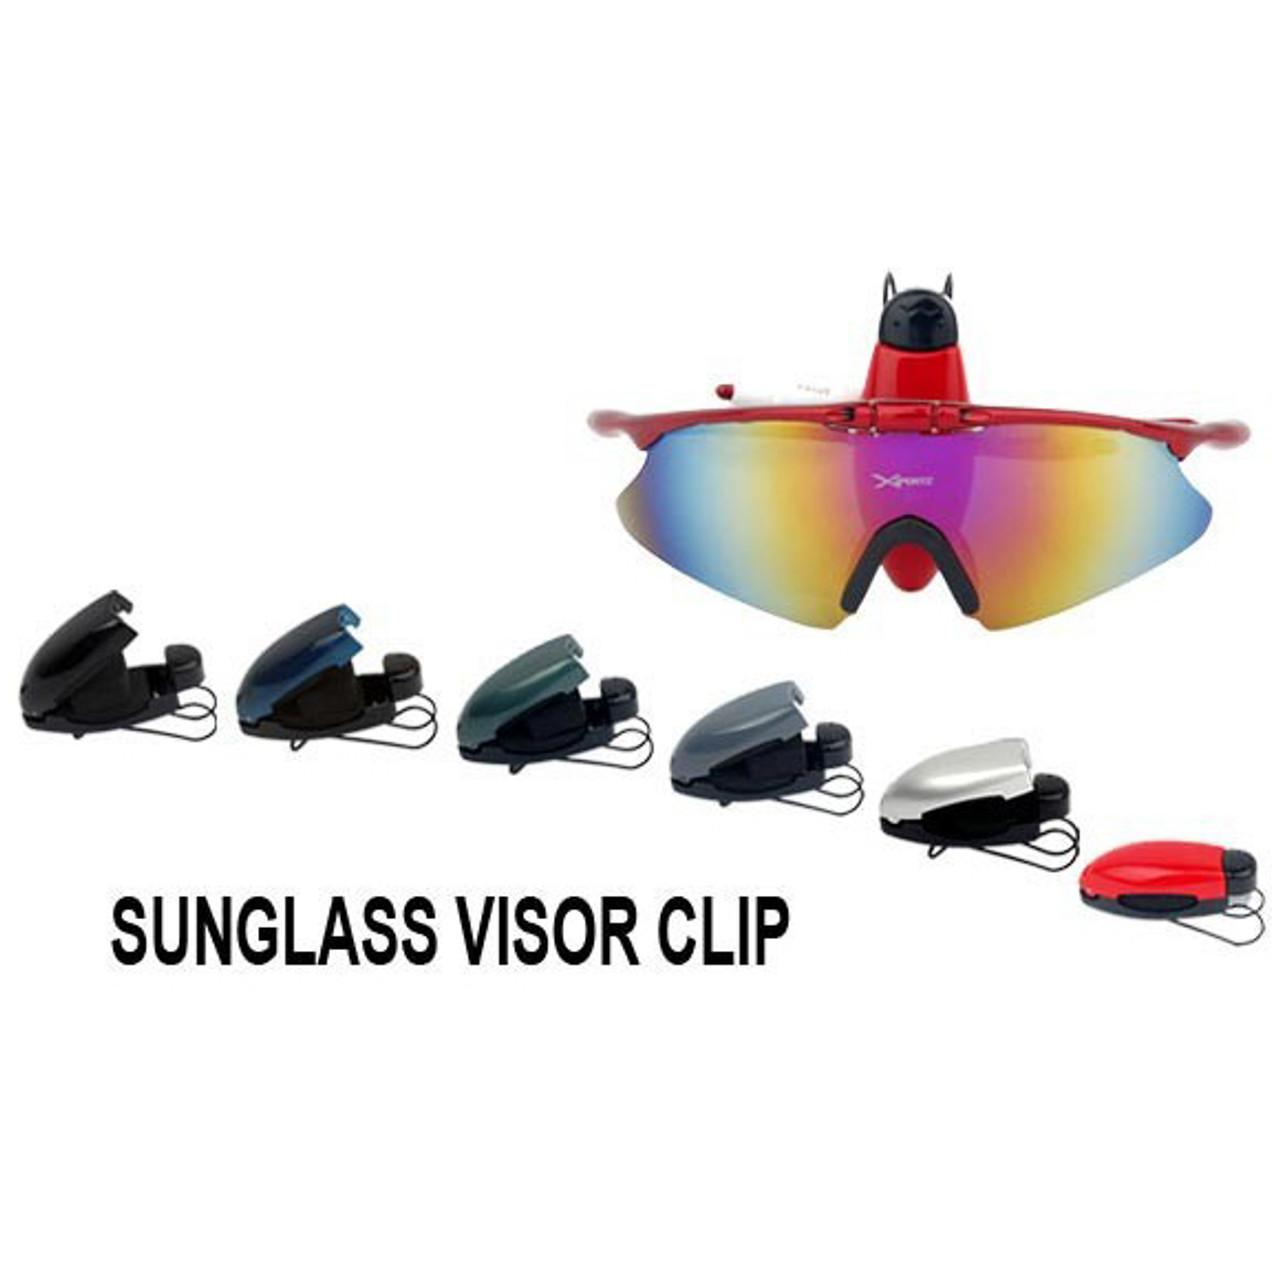 Sunglasses Visor Clips